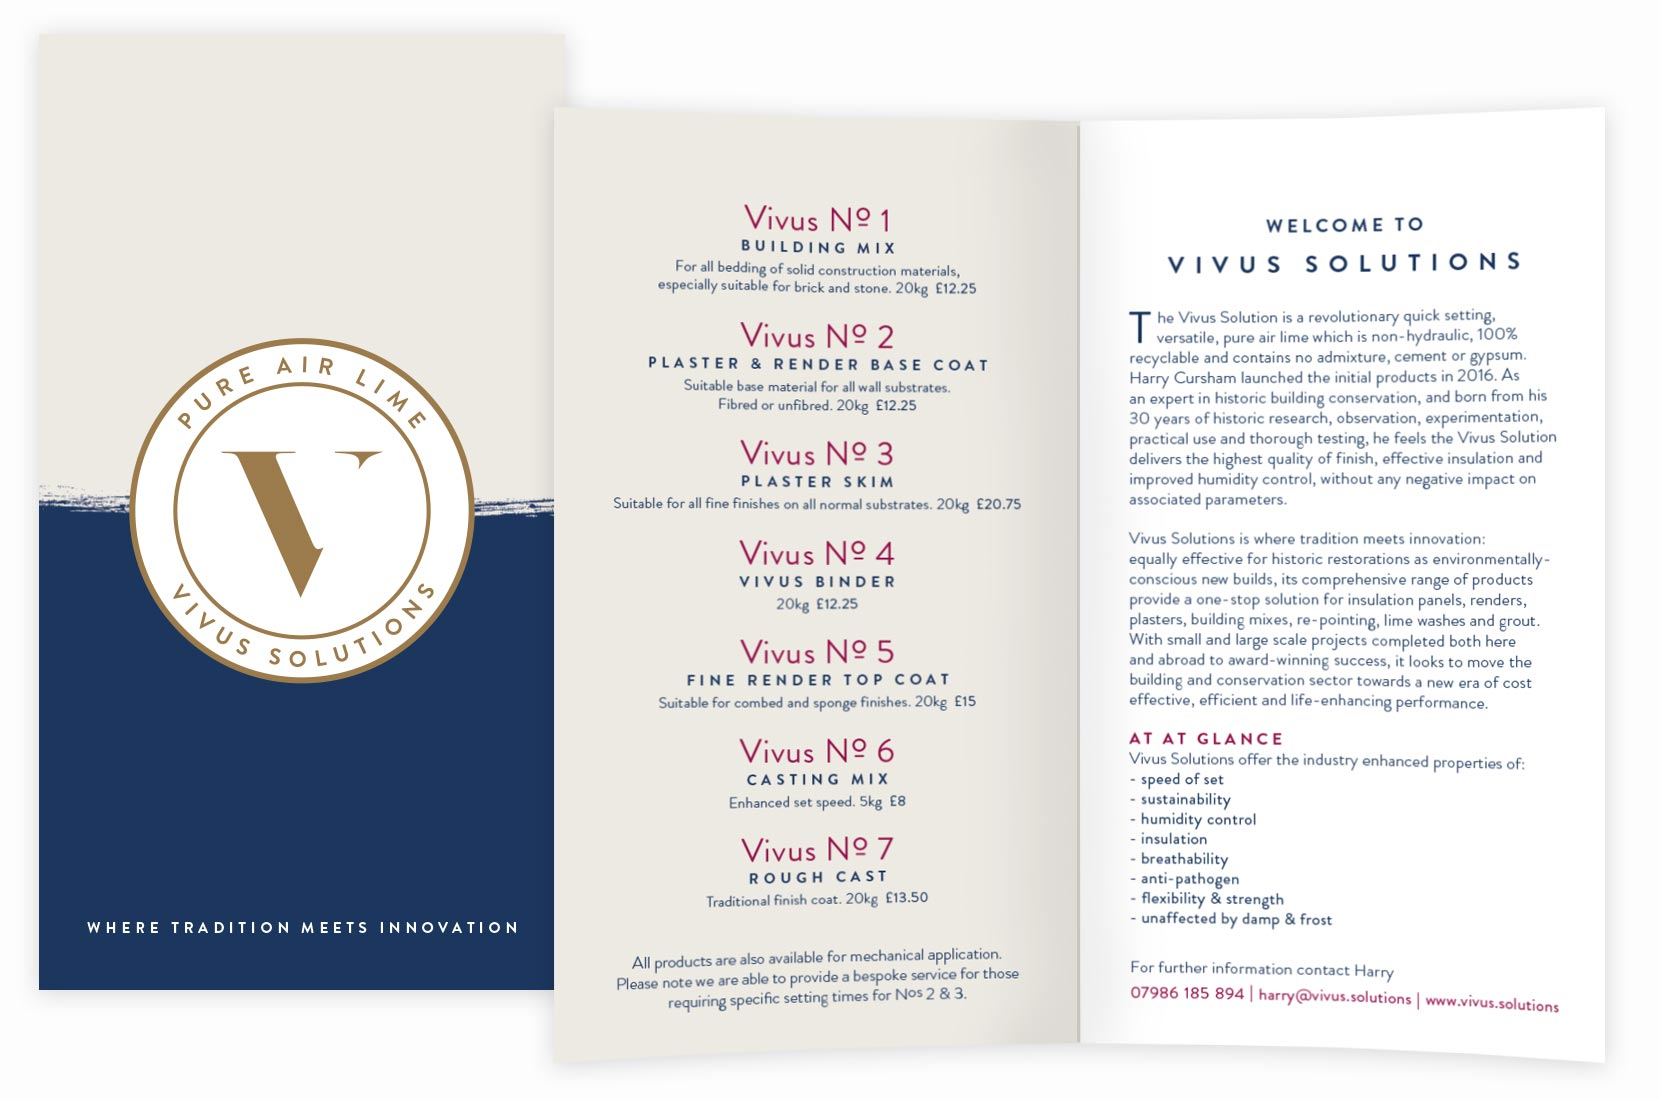 Vivus Solutions Pure Air Lime Product Leaflet